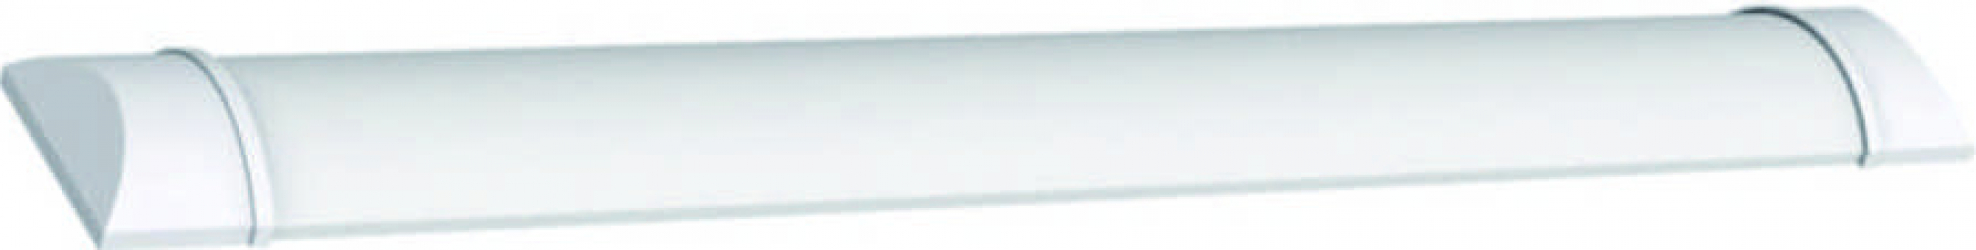 Corp liniar LED 40W 1200mm 4000K Well Corpuri de iluminat